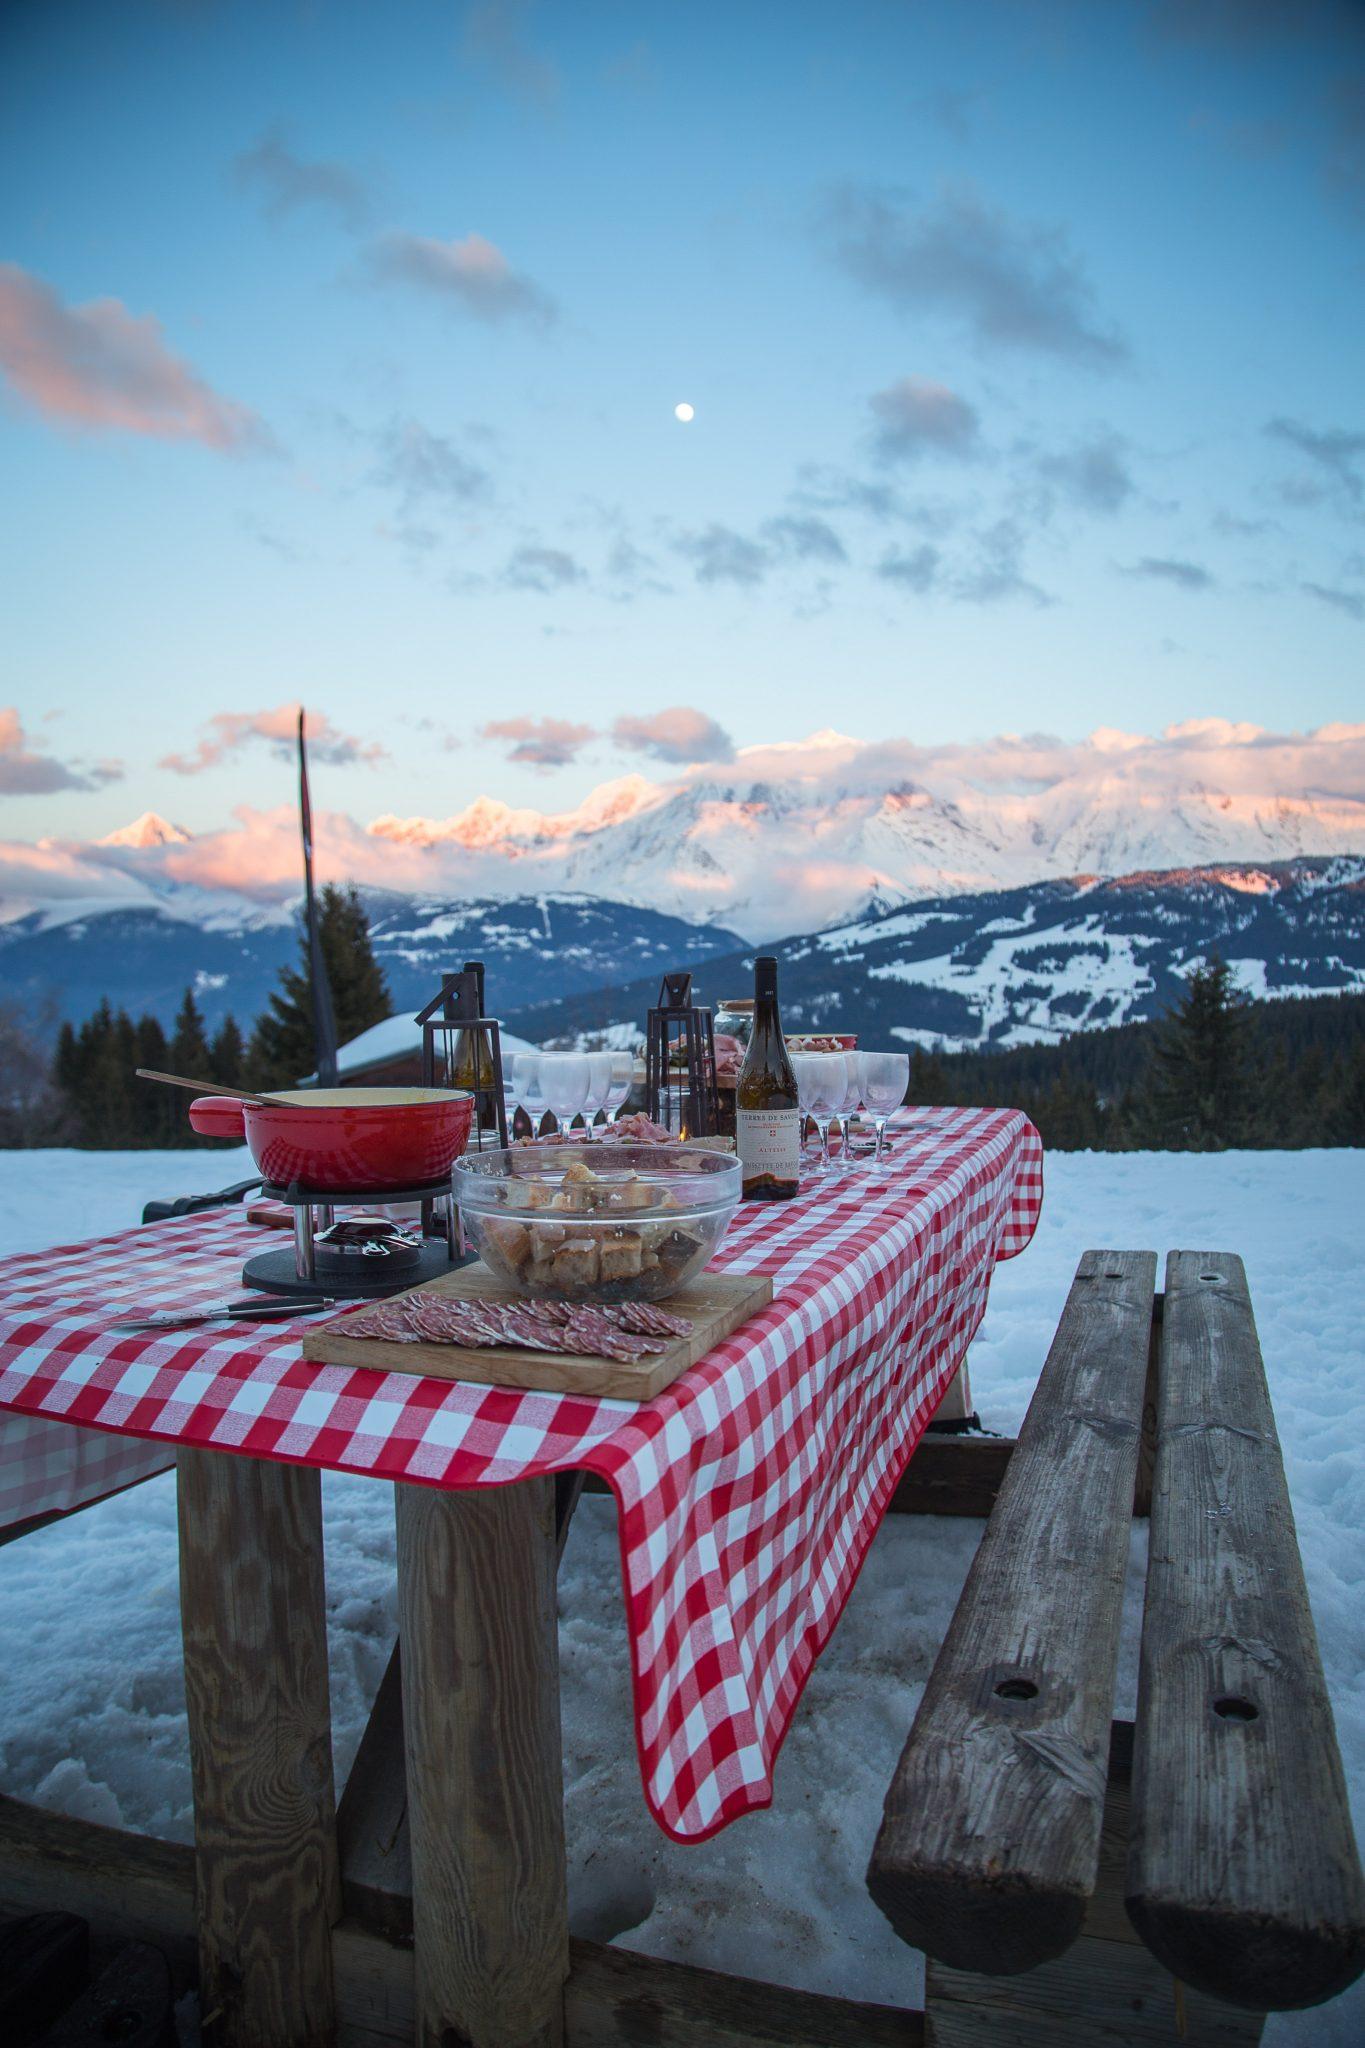 Afterwork Alpinist 2018 - Combloux-bon moment ready